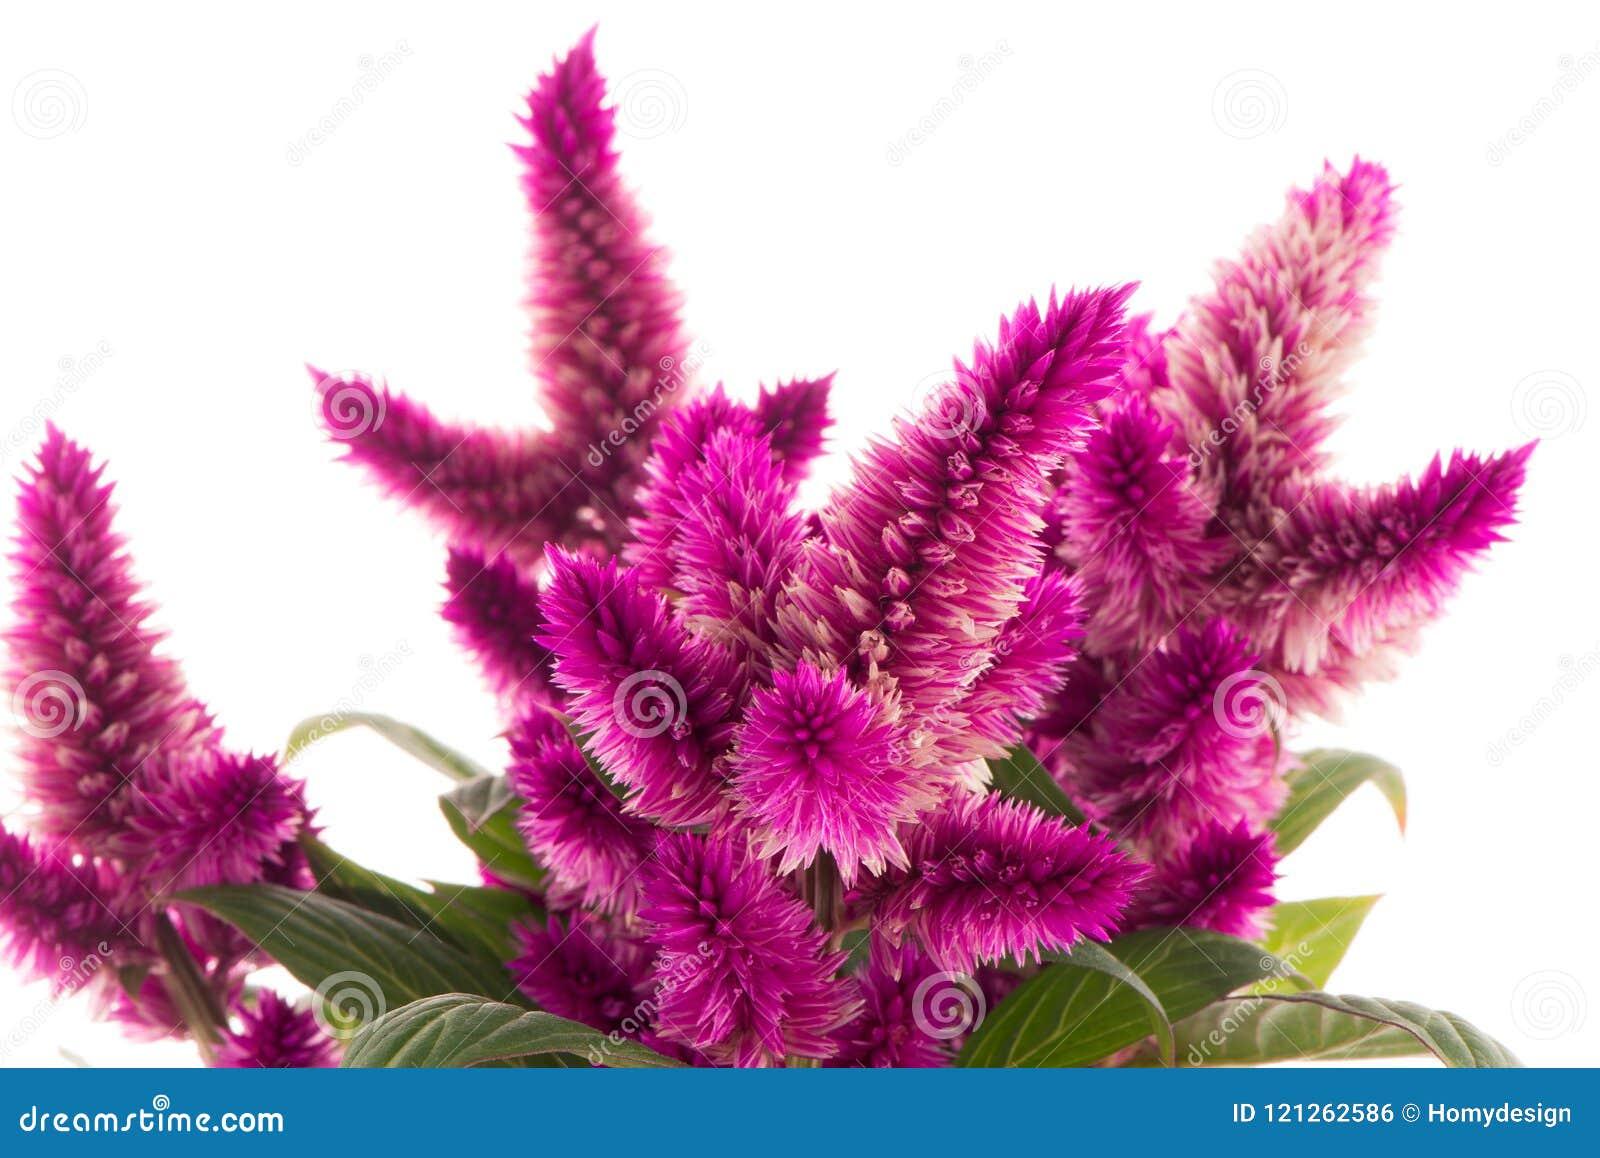 Celosia Planta De Gayo